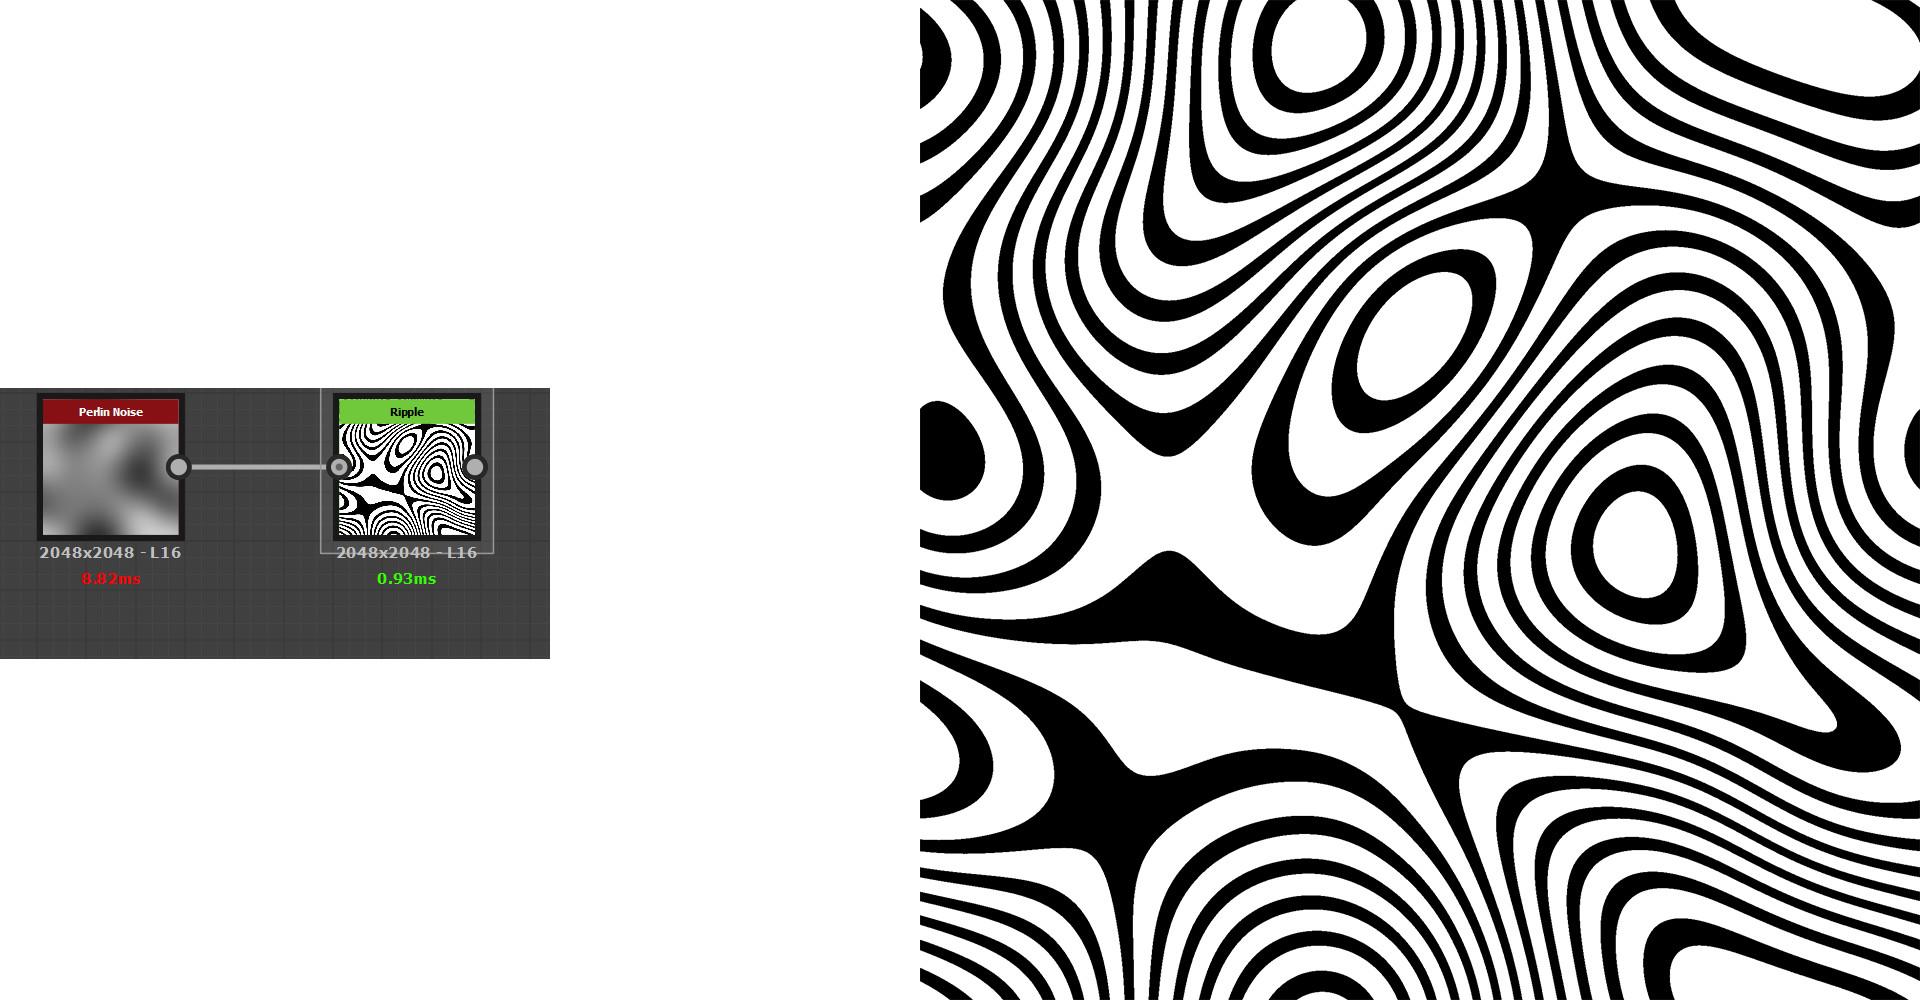 ArtStation - Ripple - Substance Designer Filter Effect, Arran Bidwell